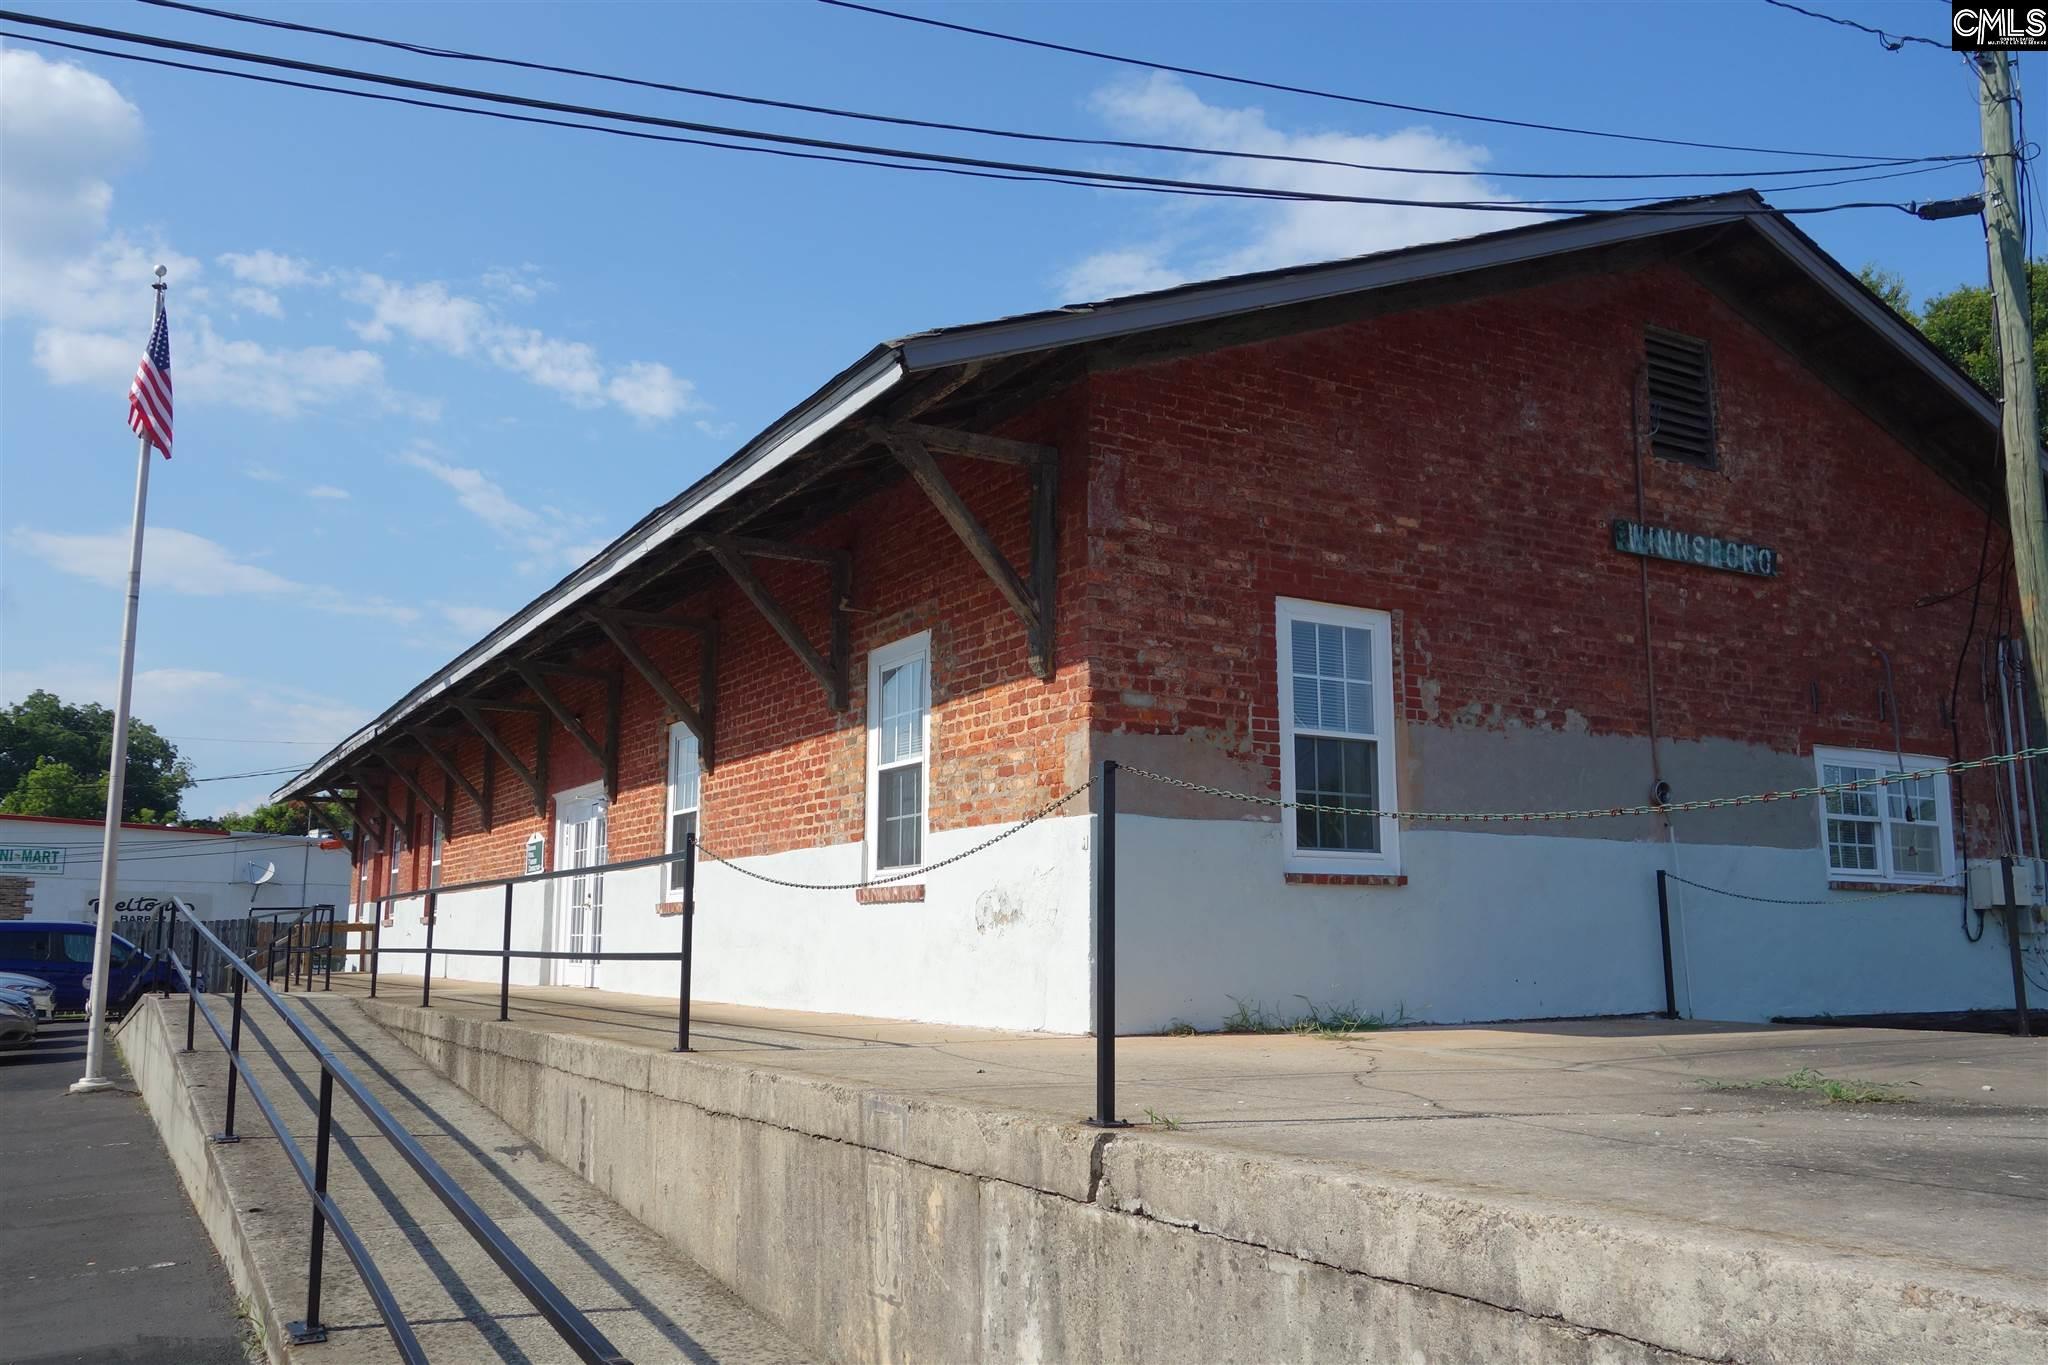 400 S Congress Street Winnsboro, SC 29180